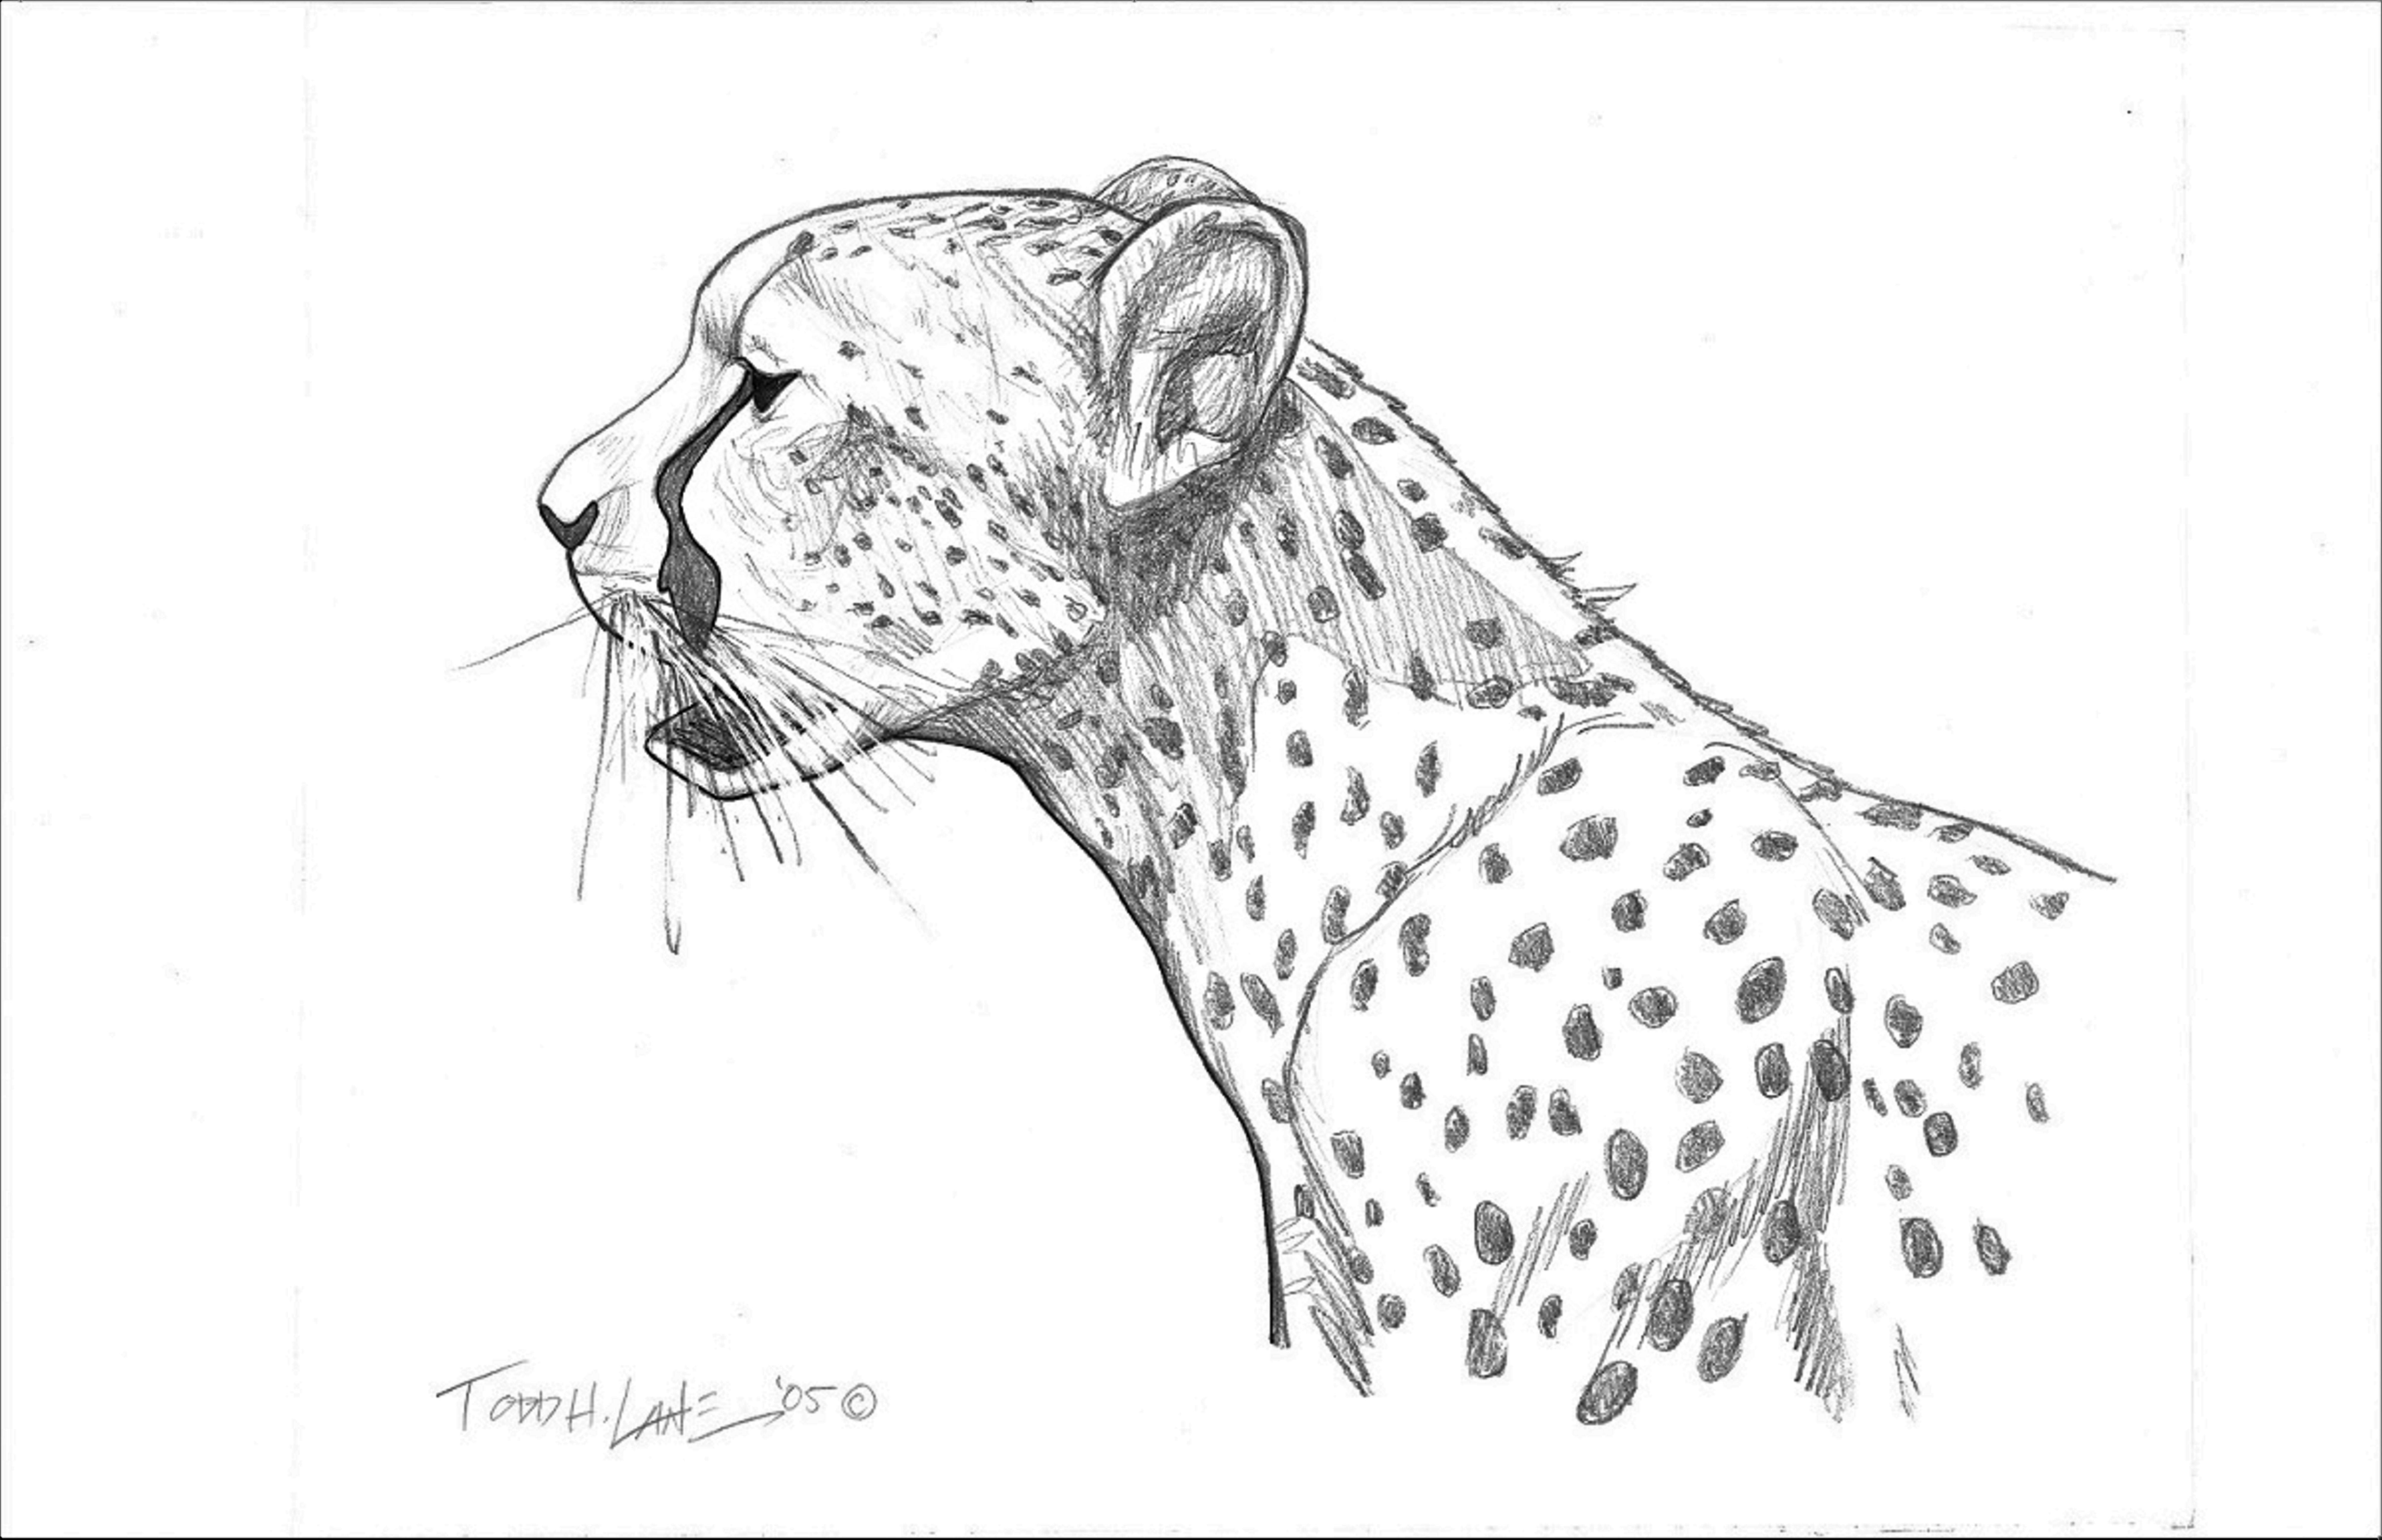 Duma Kenya Series Image 2 artwork by Todd Lane - art listed for sale on Artplode